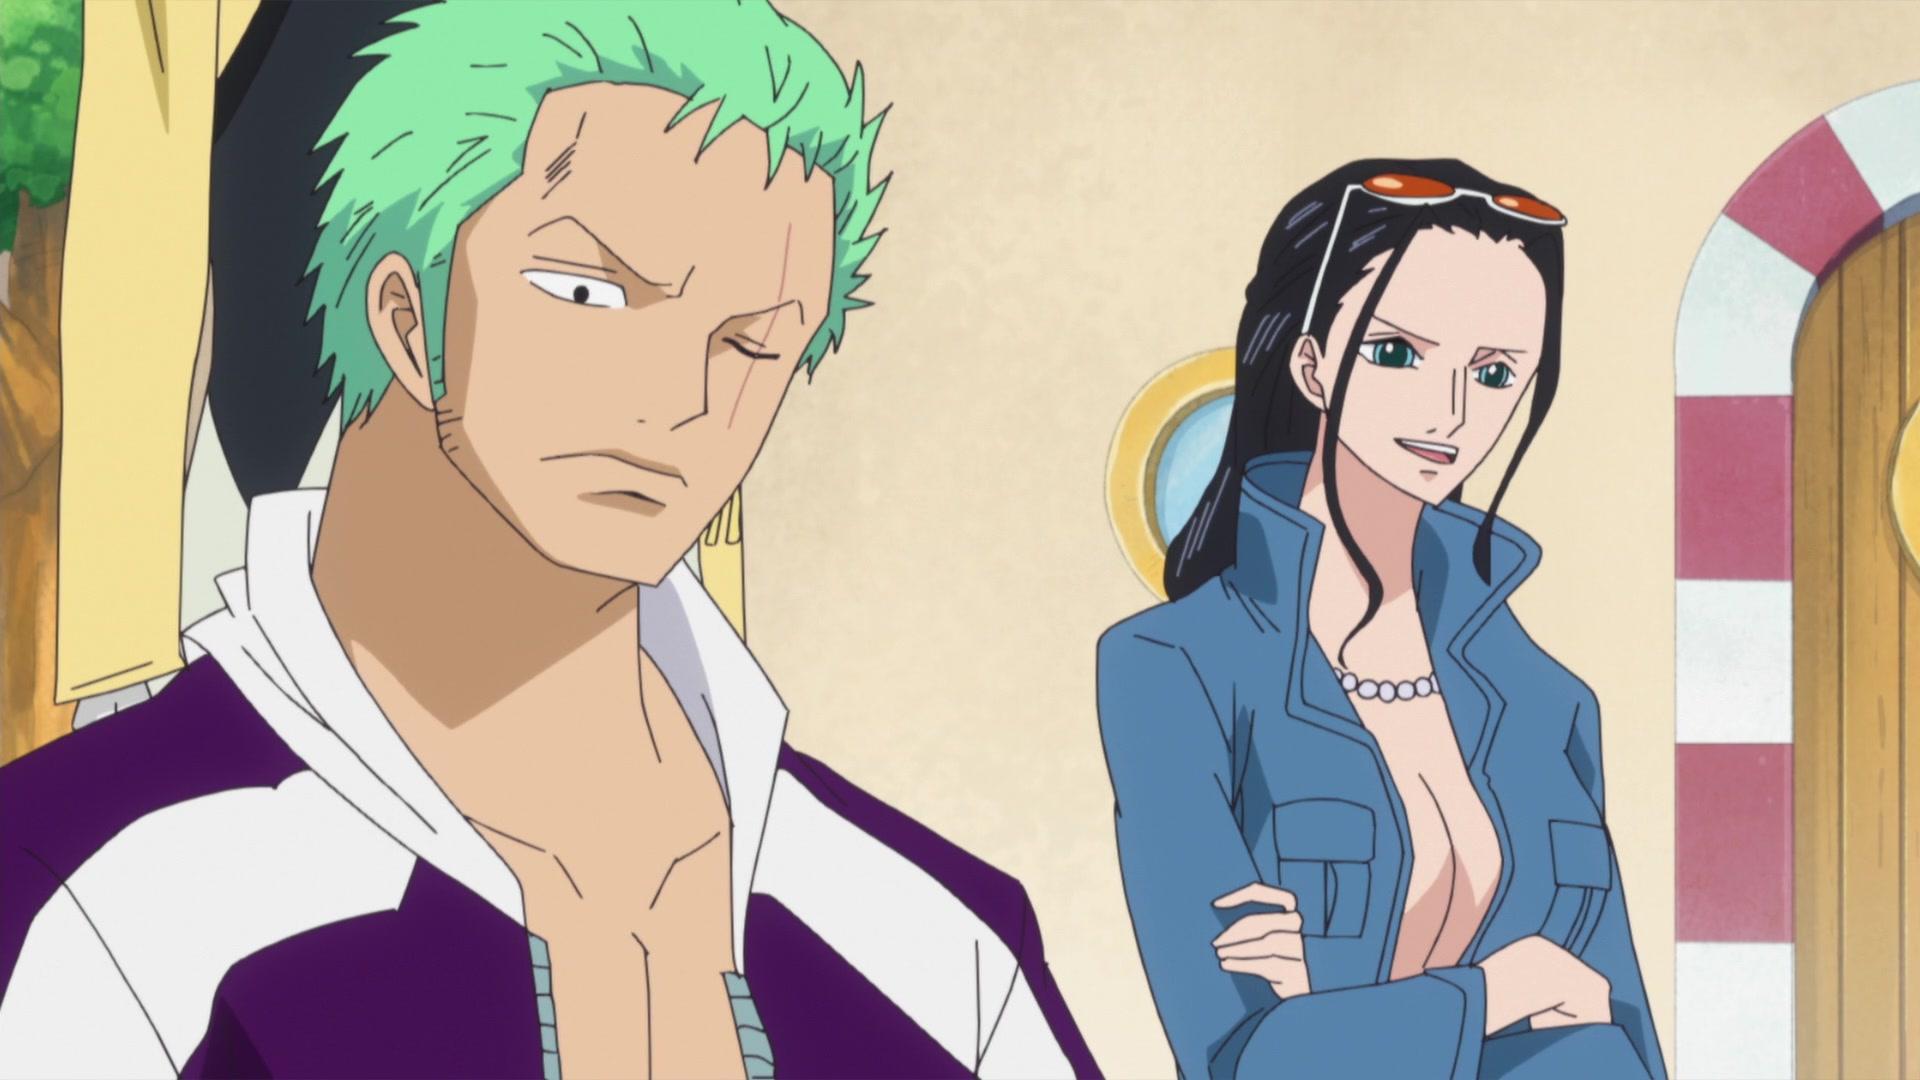 One Piece: Punk Hazard (575-629) Episode 575, Z's Ambition! Lily the